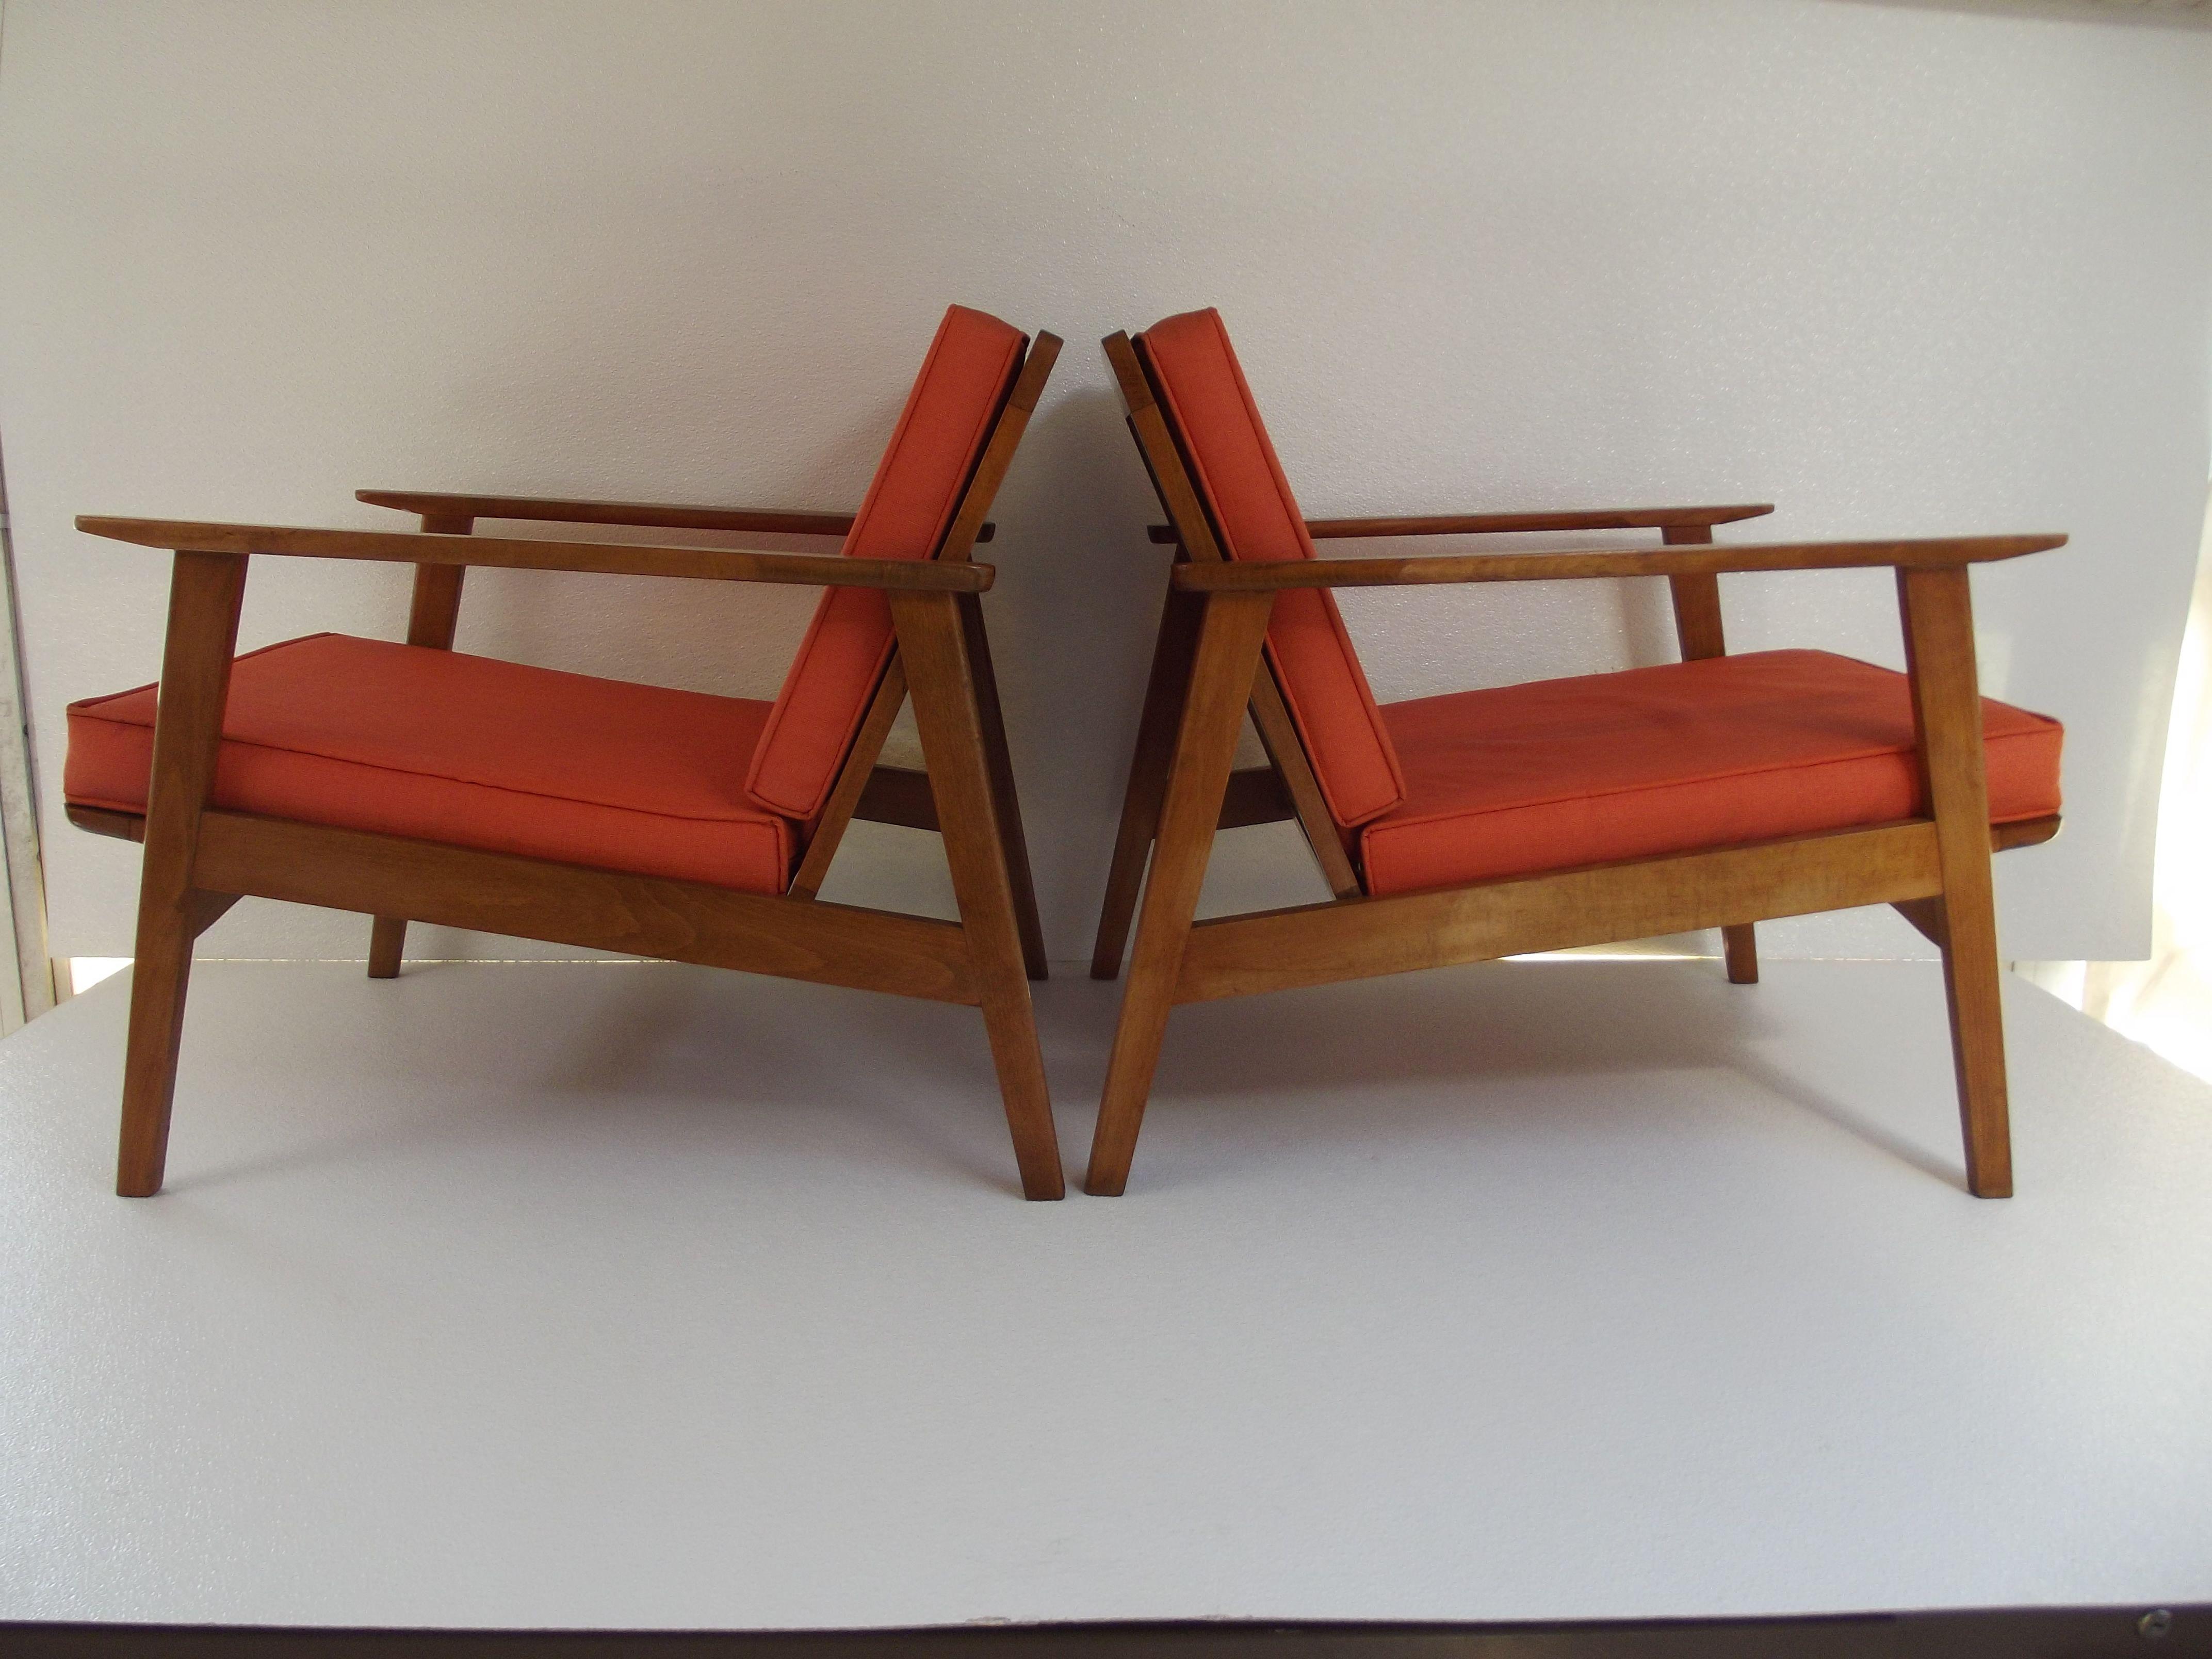 yugoslavian folding chair plastic adirondack pair 1960 39s danish modern lounge chairs made in yugoslavia